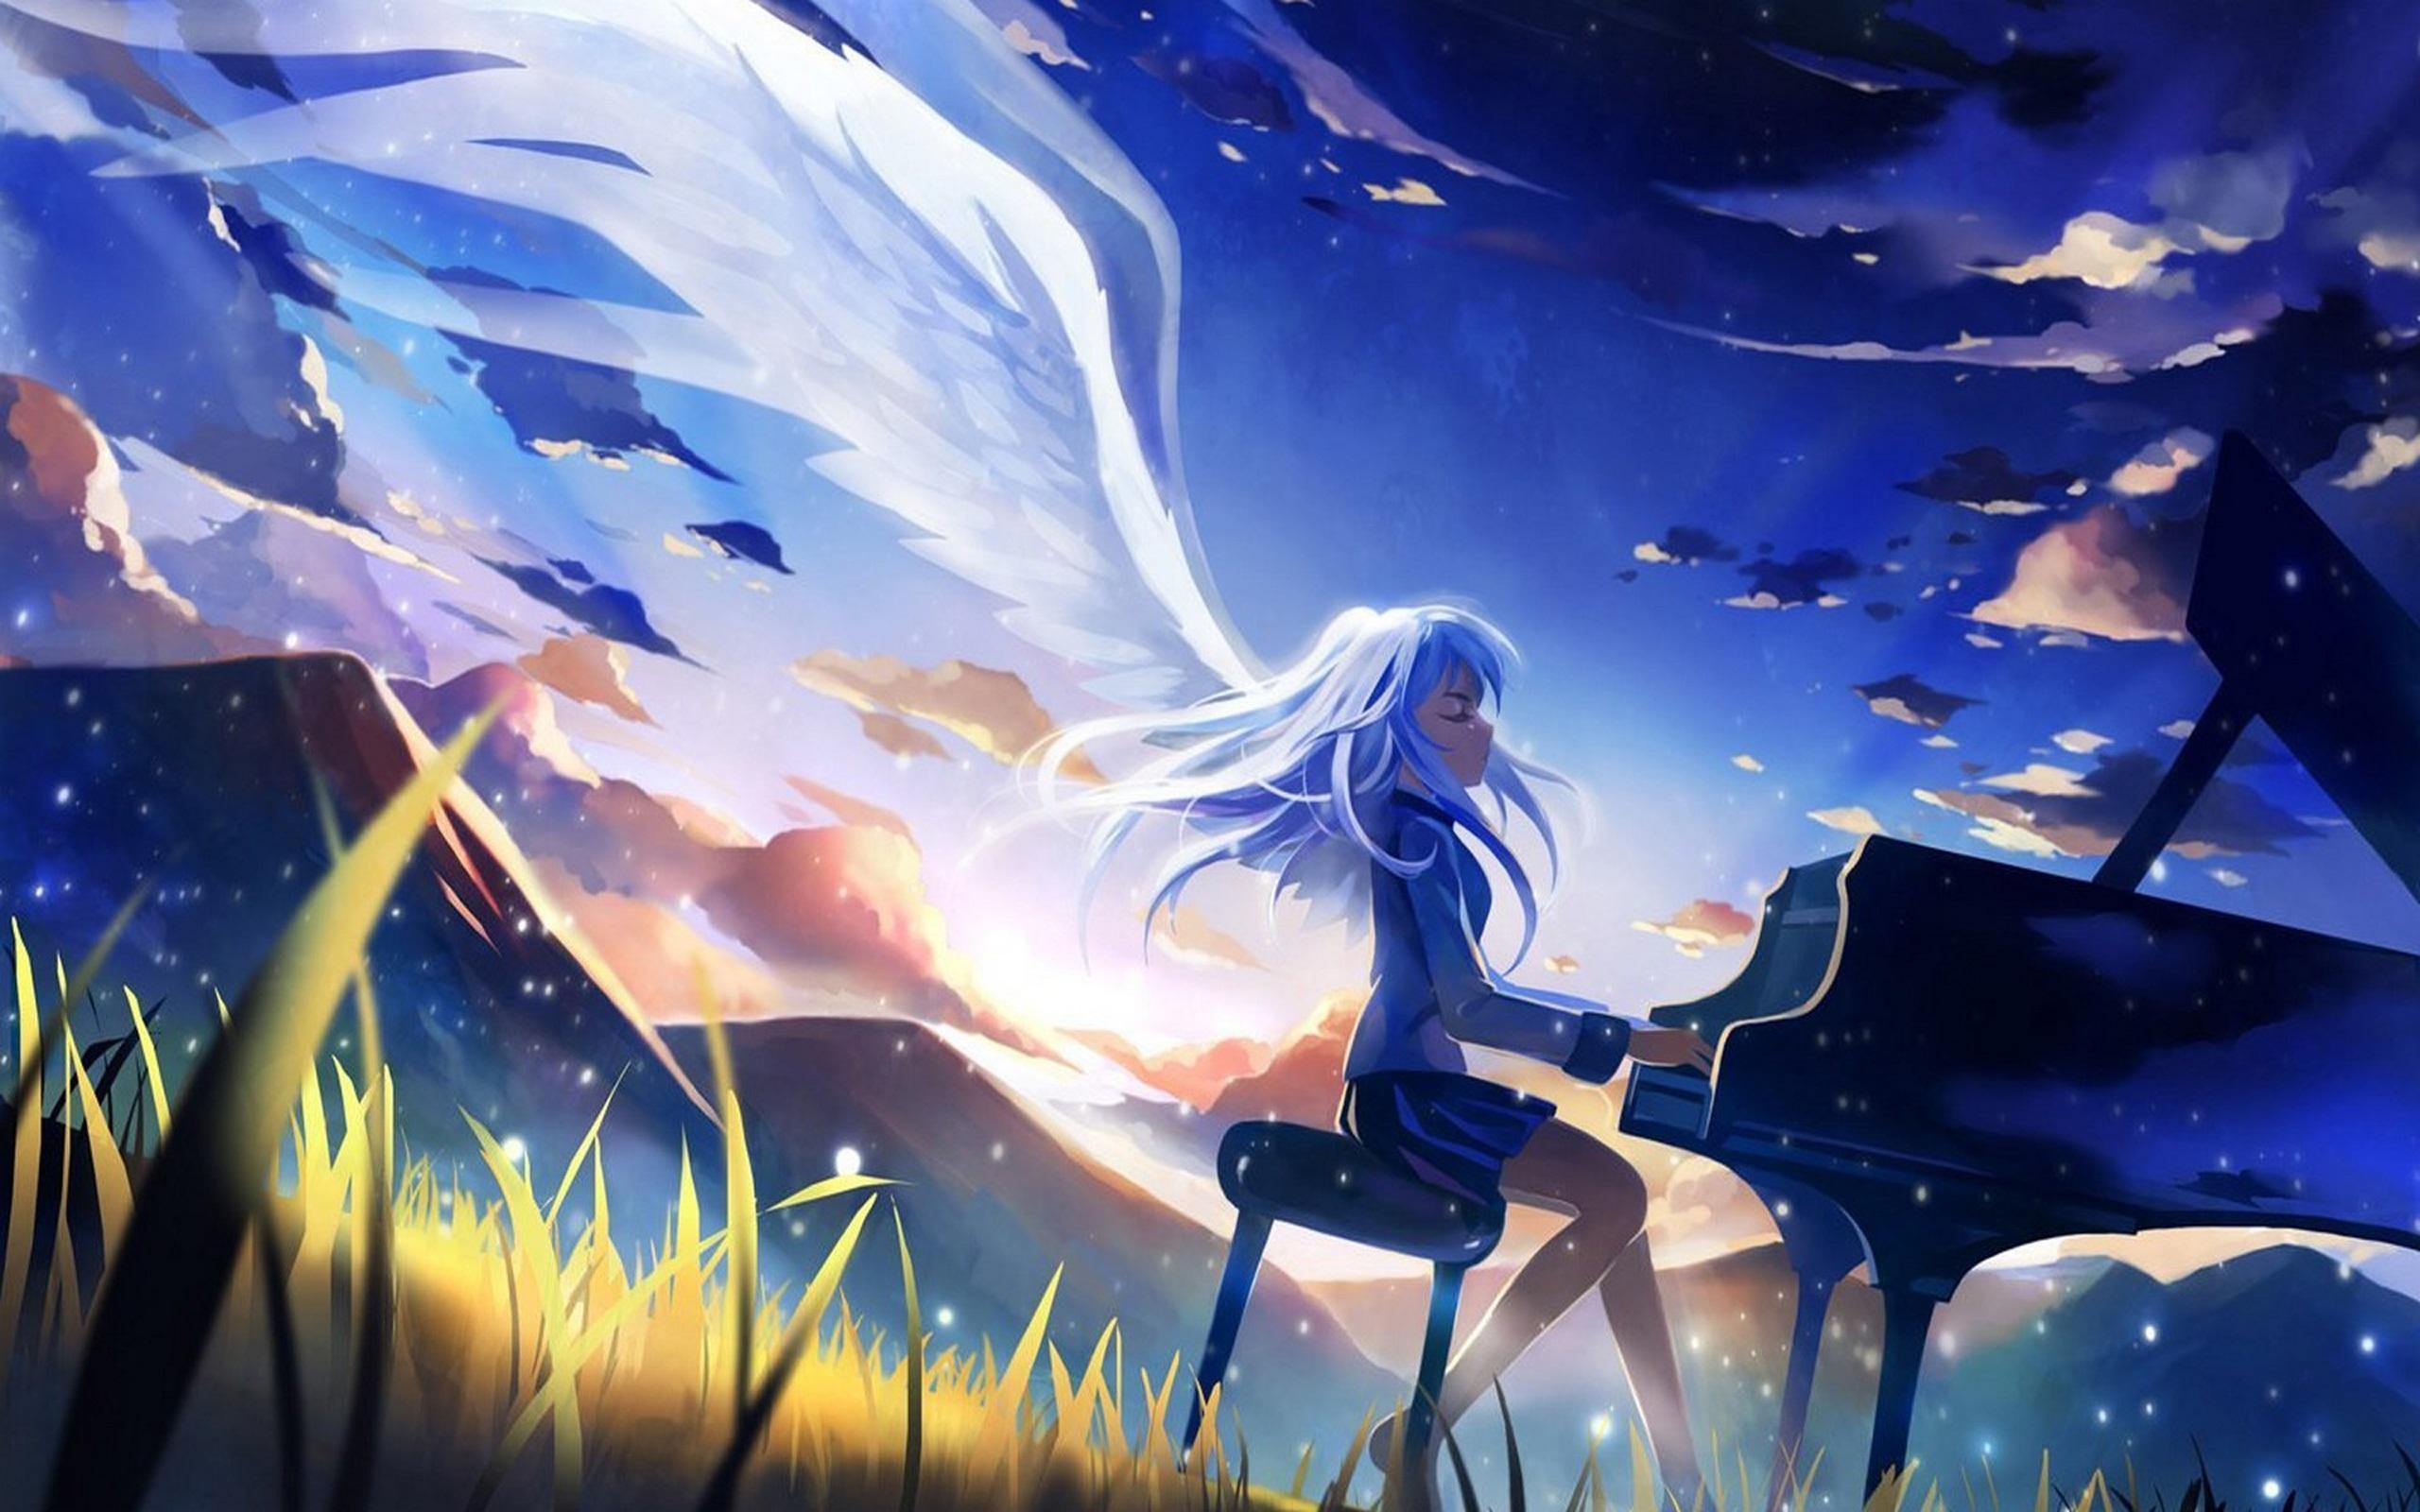 Wallpaper Anime Girls Angel Beats Tachibana Kanade